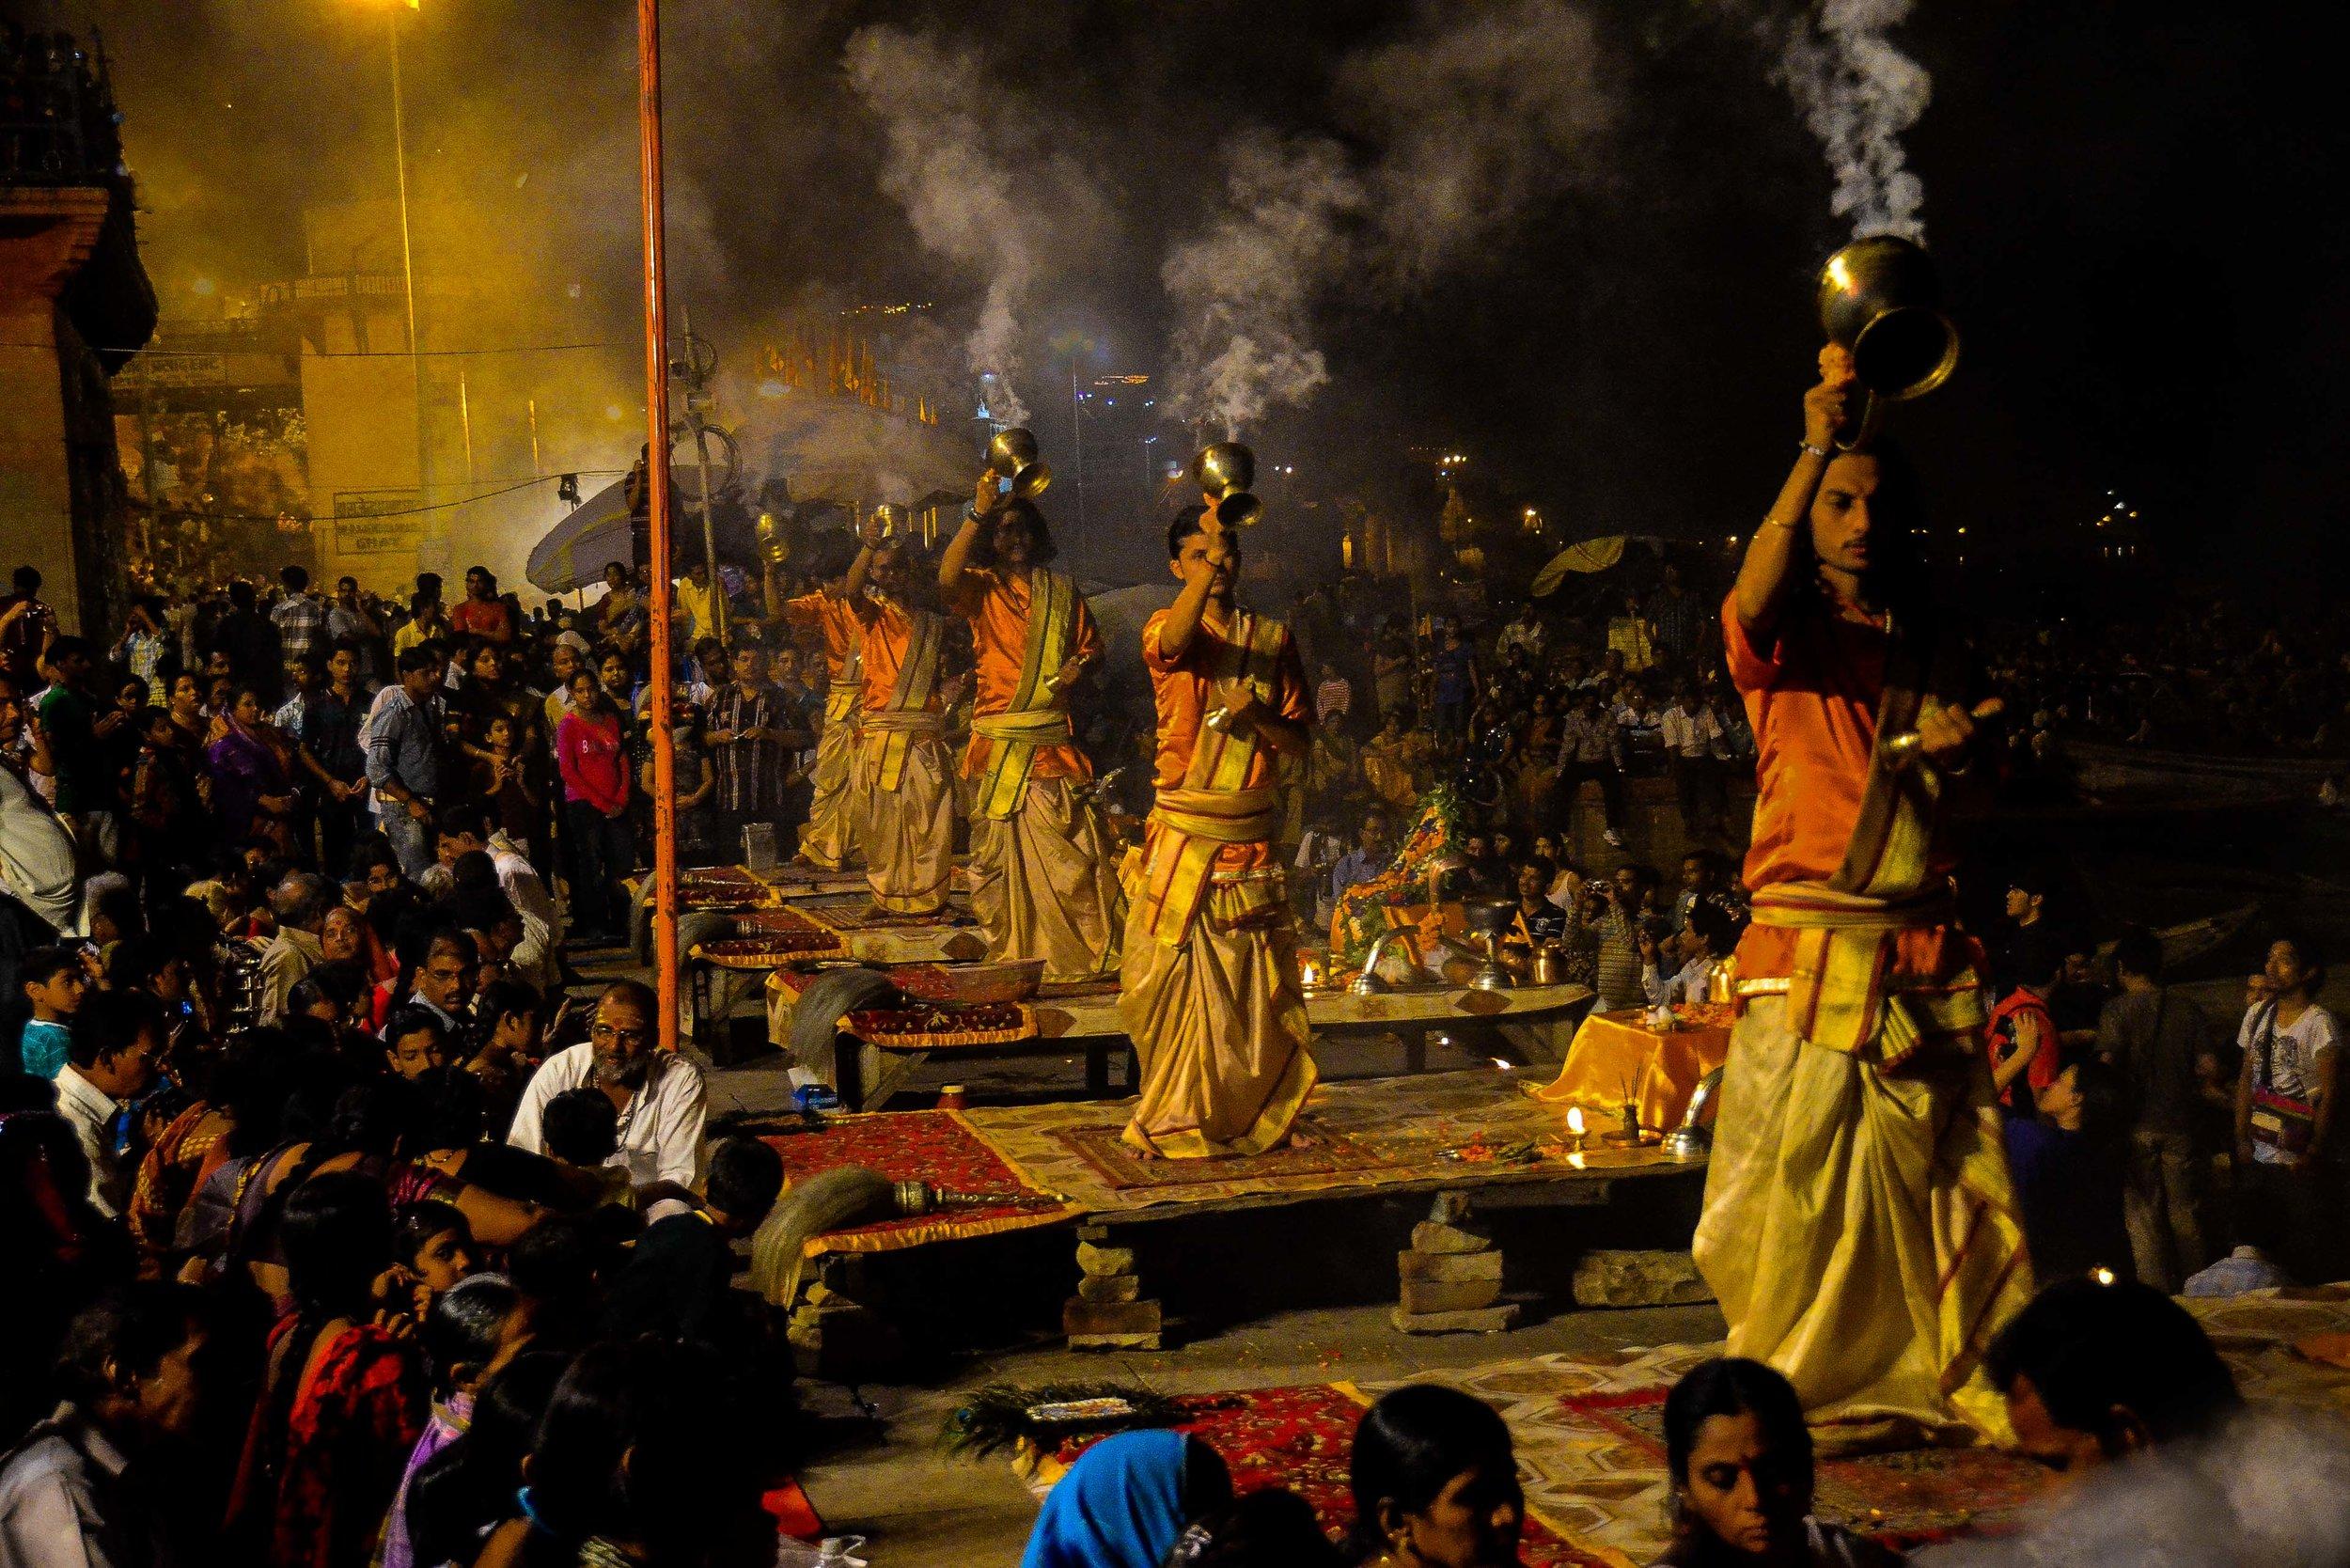 Evening Memorial Tribute 2, Varanasi, India 2012